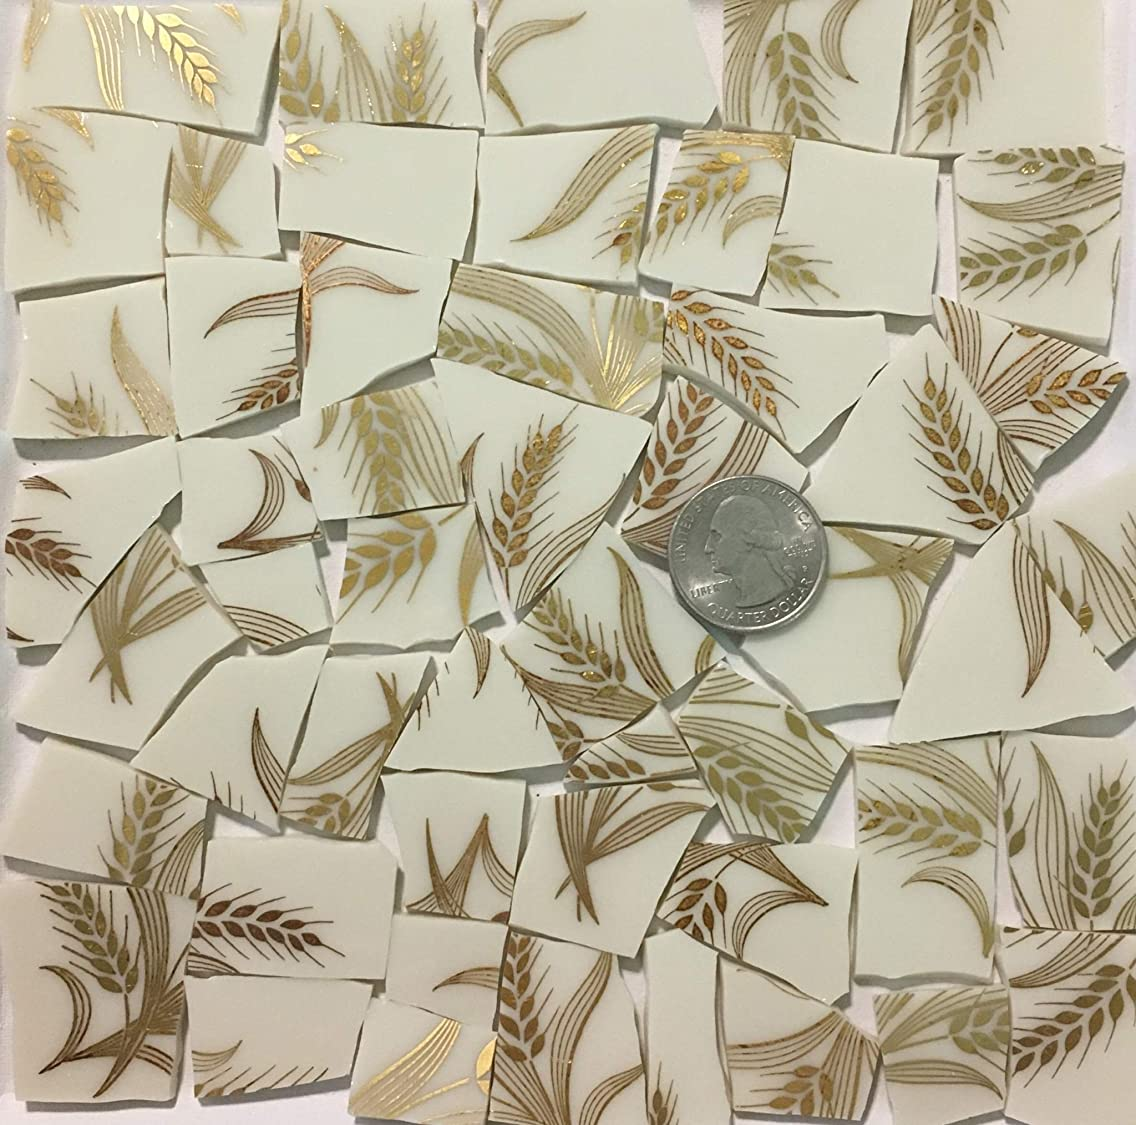 Mosaic Art & Crafts Supply ~ Metallic Gold Wheat Design Cream White China Tiles (B897)